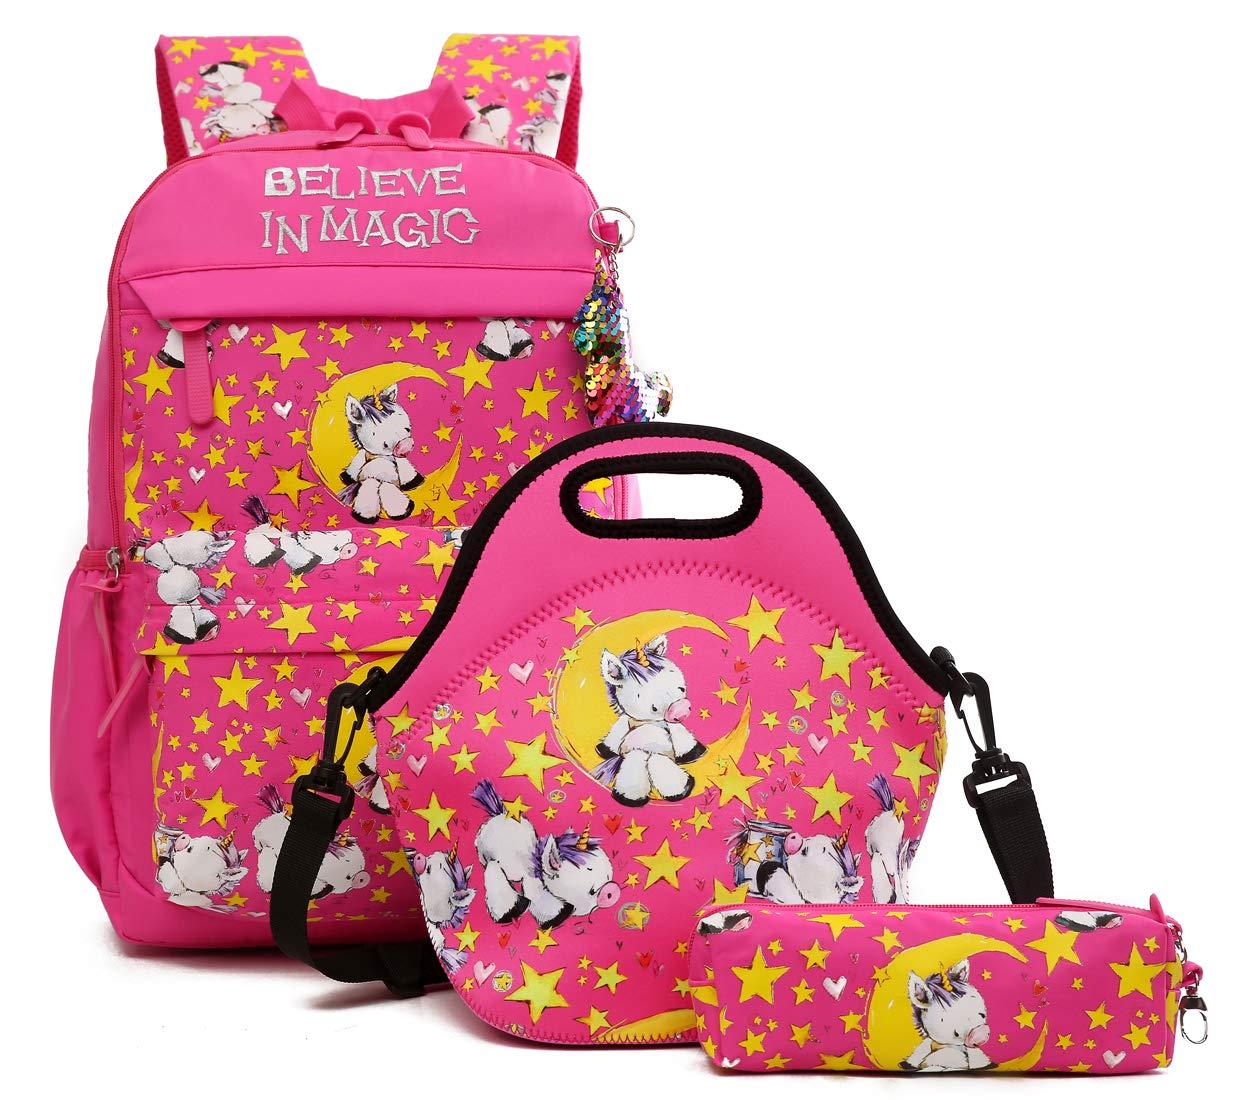 Debbieicy Cute Unicorn Lightweight Princess Backpack Kids School Bookbag with Lunch Bag Pen Bag for Preschool, Kindergarten, Elementary Girls (Rose Set)